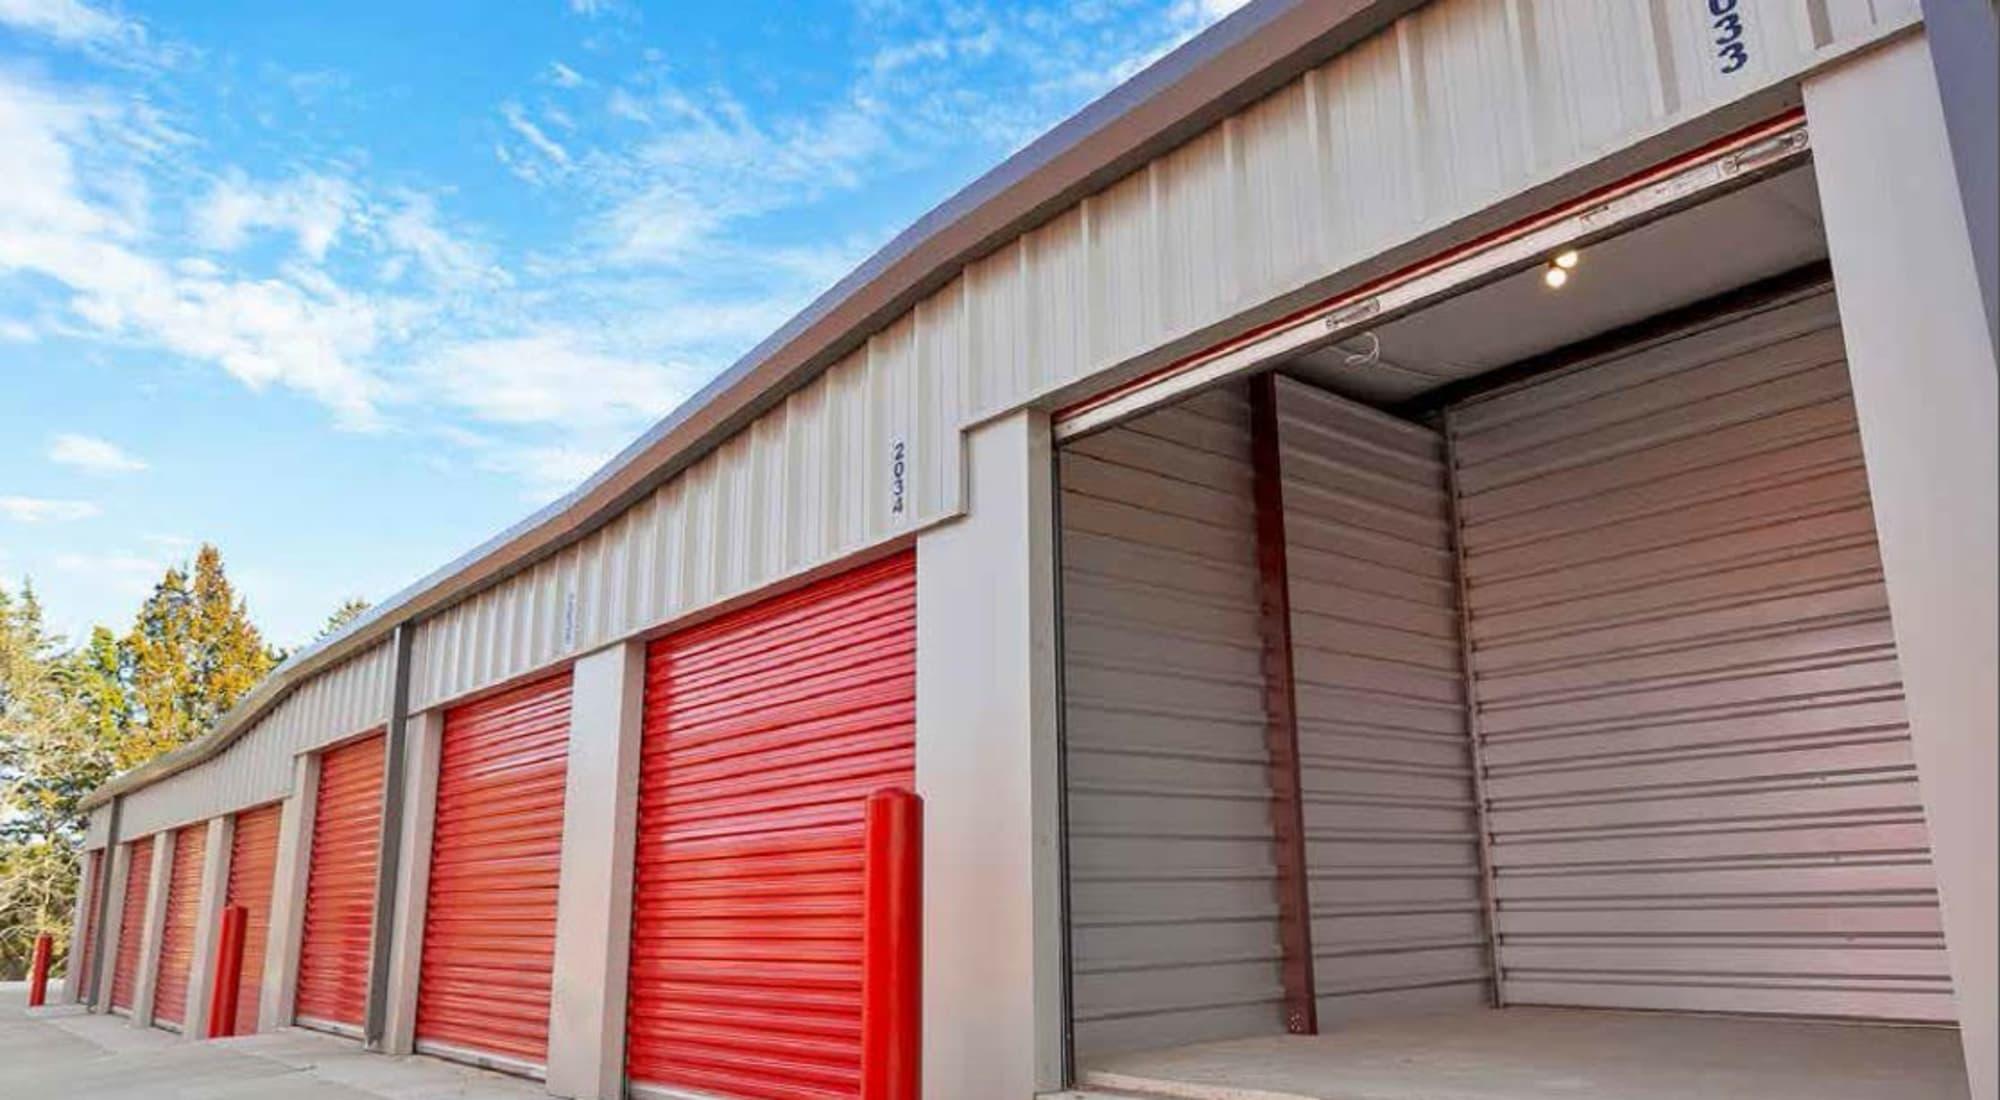 Global Self Storage in Edmond, Oklahoma